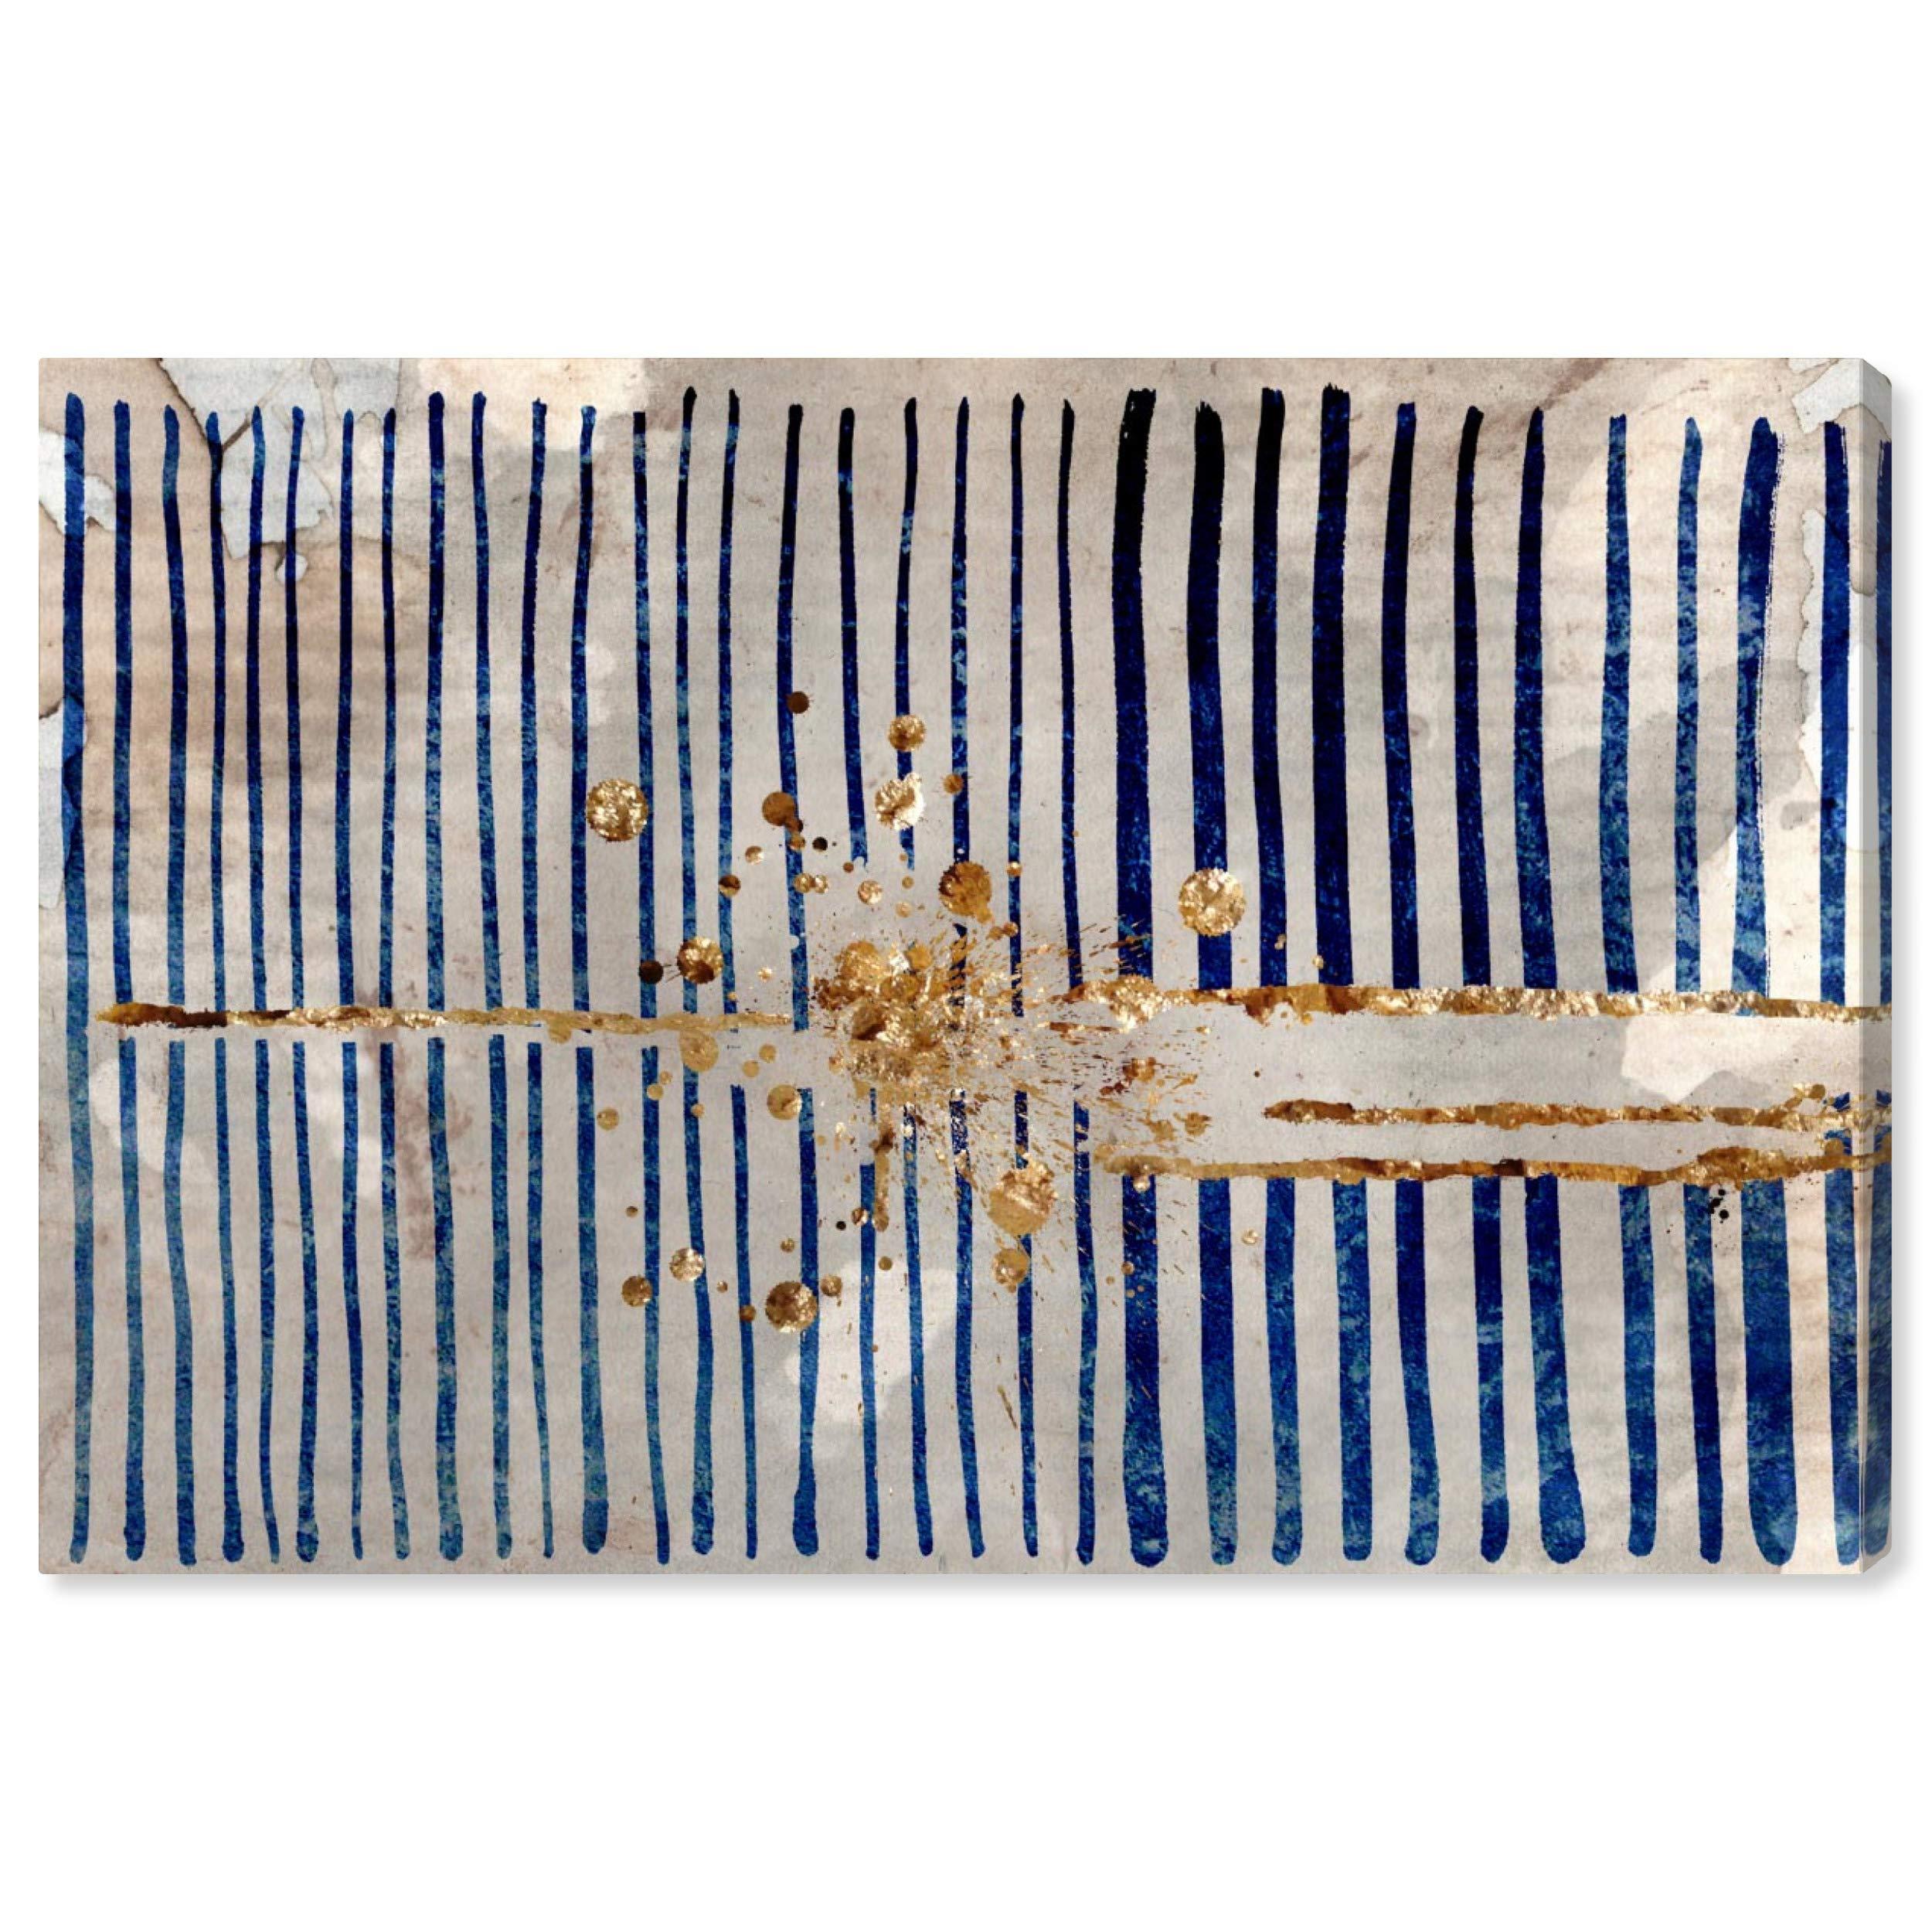 Rivet Blue Stripes and Gold Burst Canvas Print, 36'' x 24''